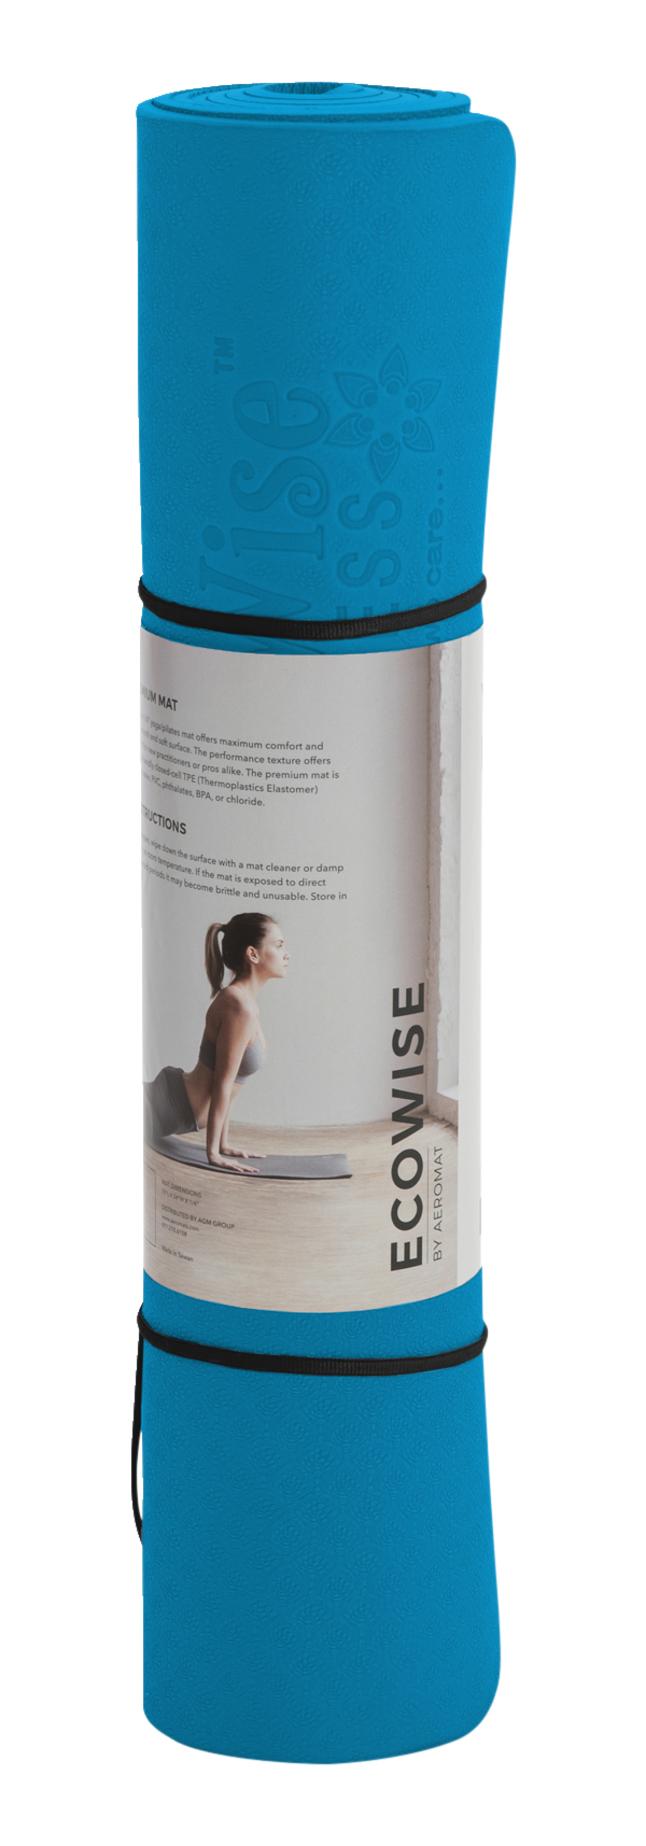 Yoga Supplies, Pilates Supplies, Item Number 2020979